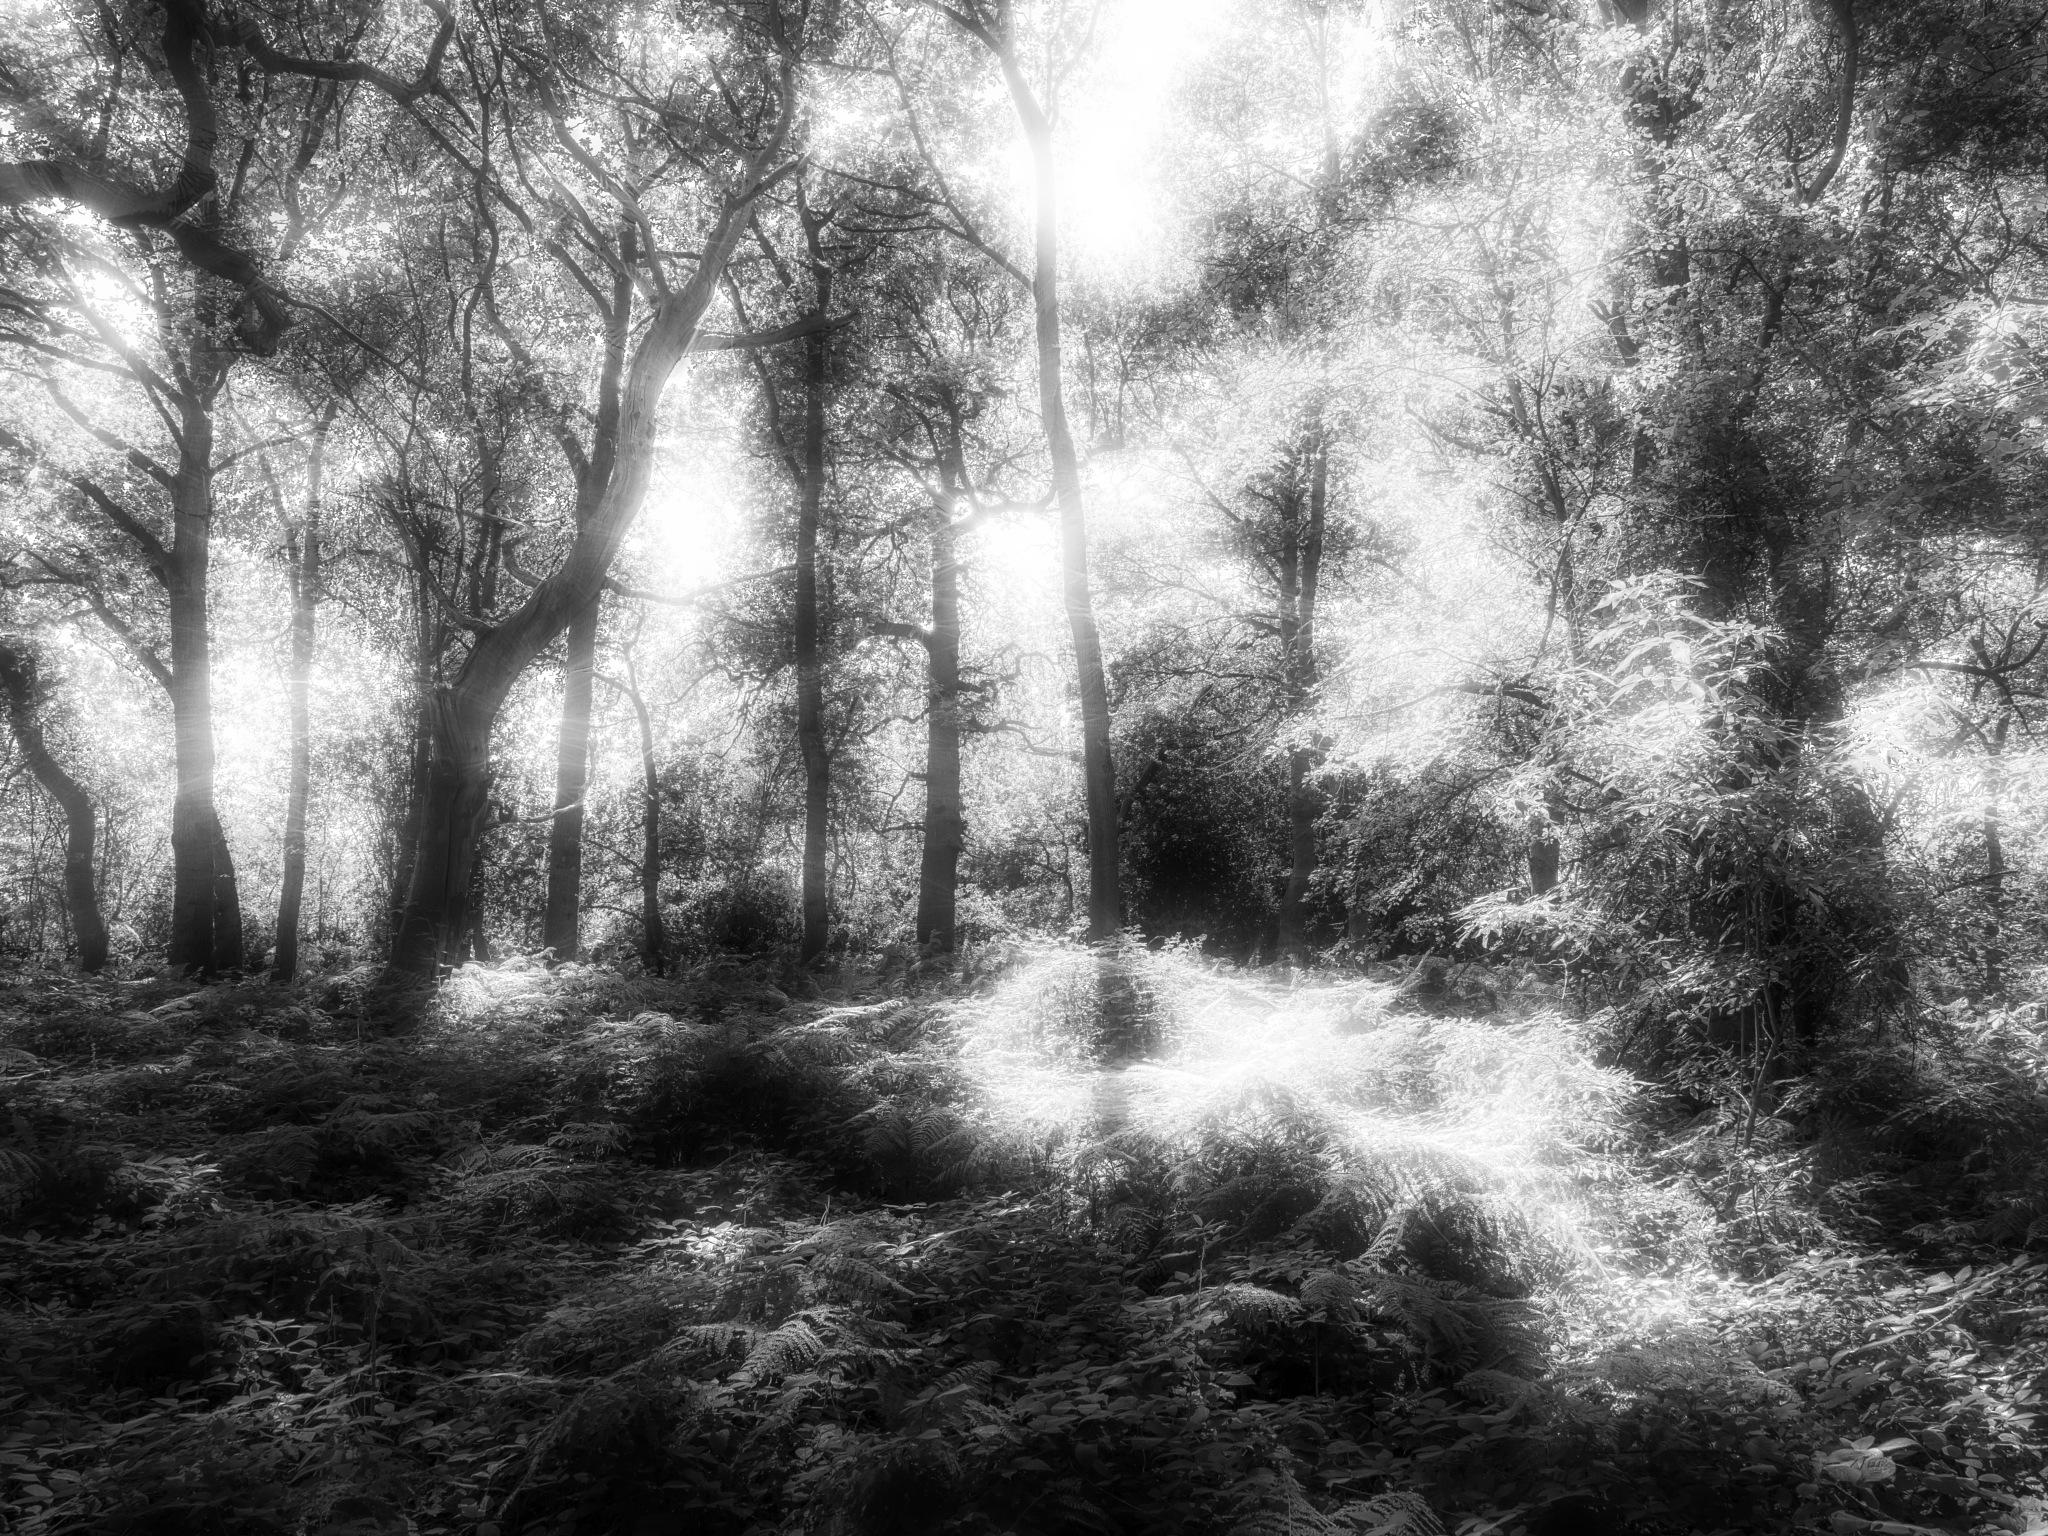 Ghost Series 6 by Sarah Walters